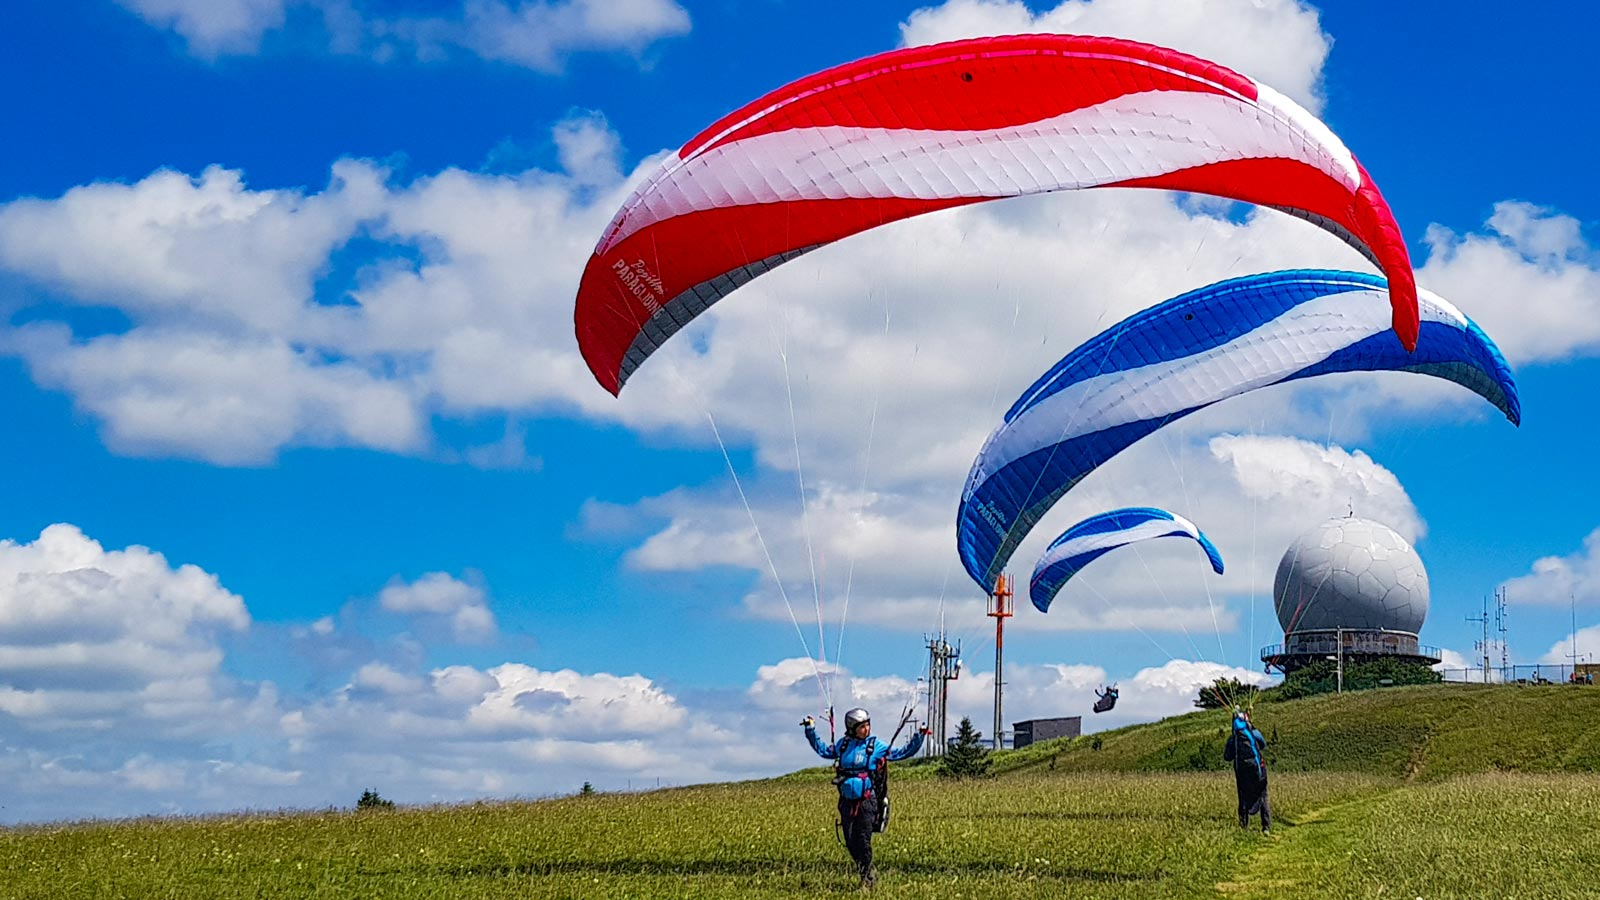 Horizon Papillon Paragliders